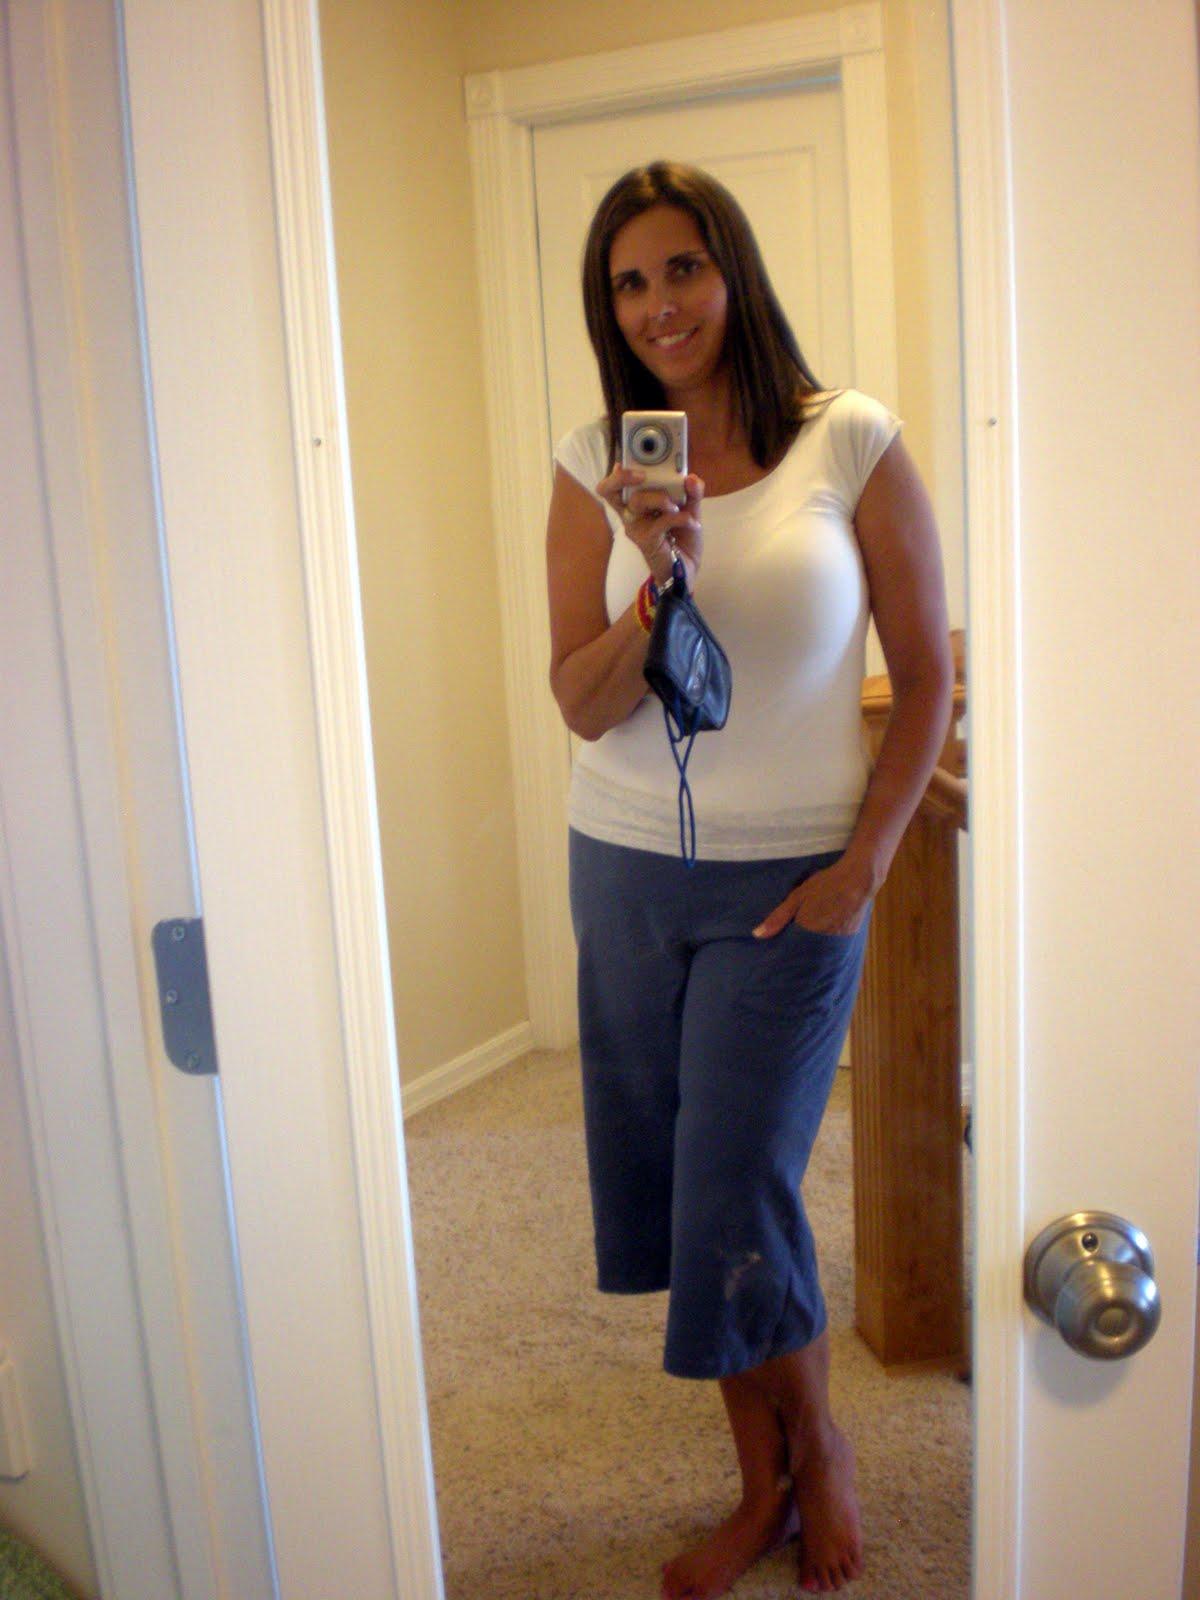 xxl t shirt into yoga pants | the thrifty ba